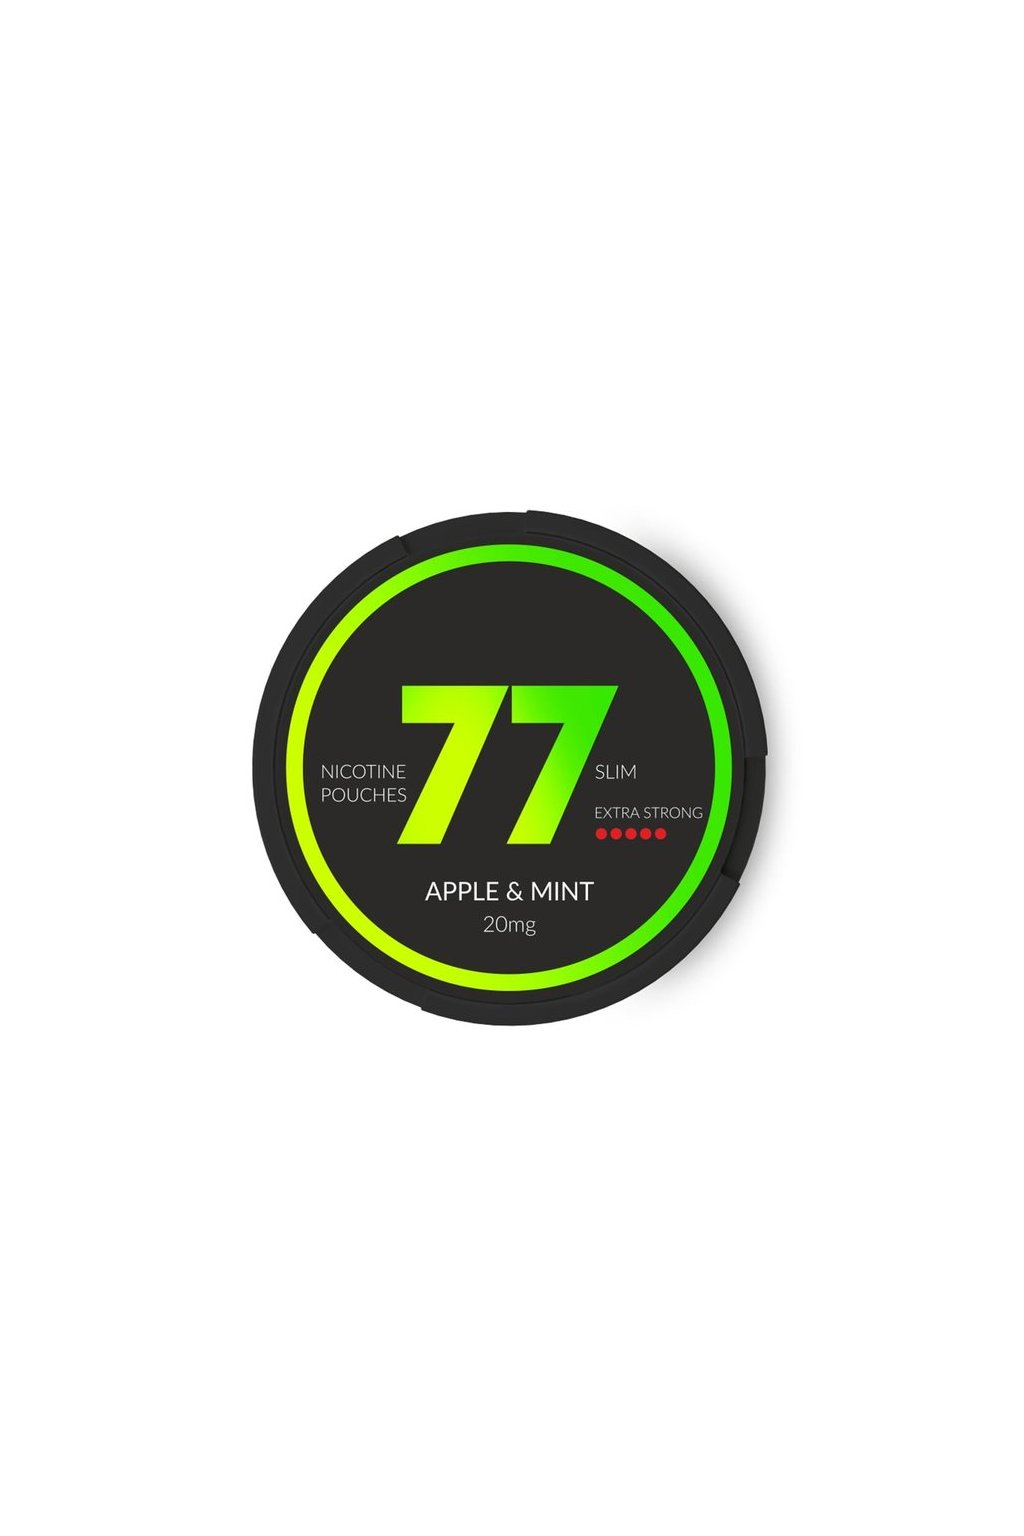 77 apple mint nikotinove sacky nicopods